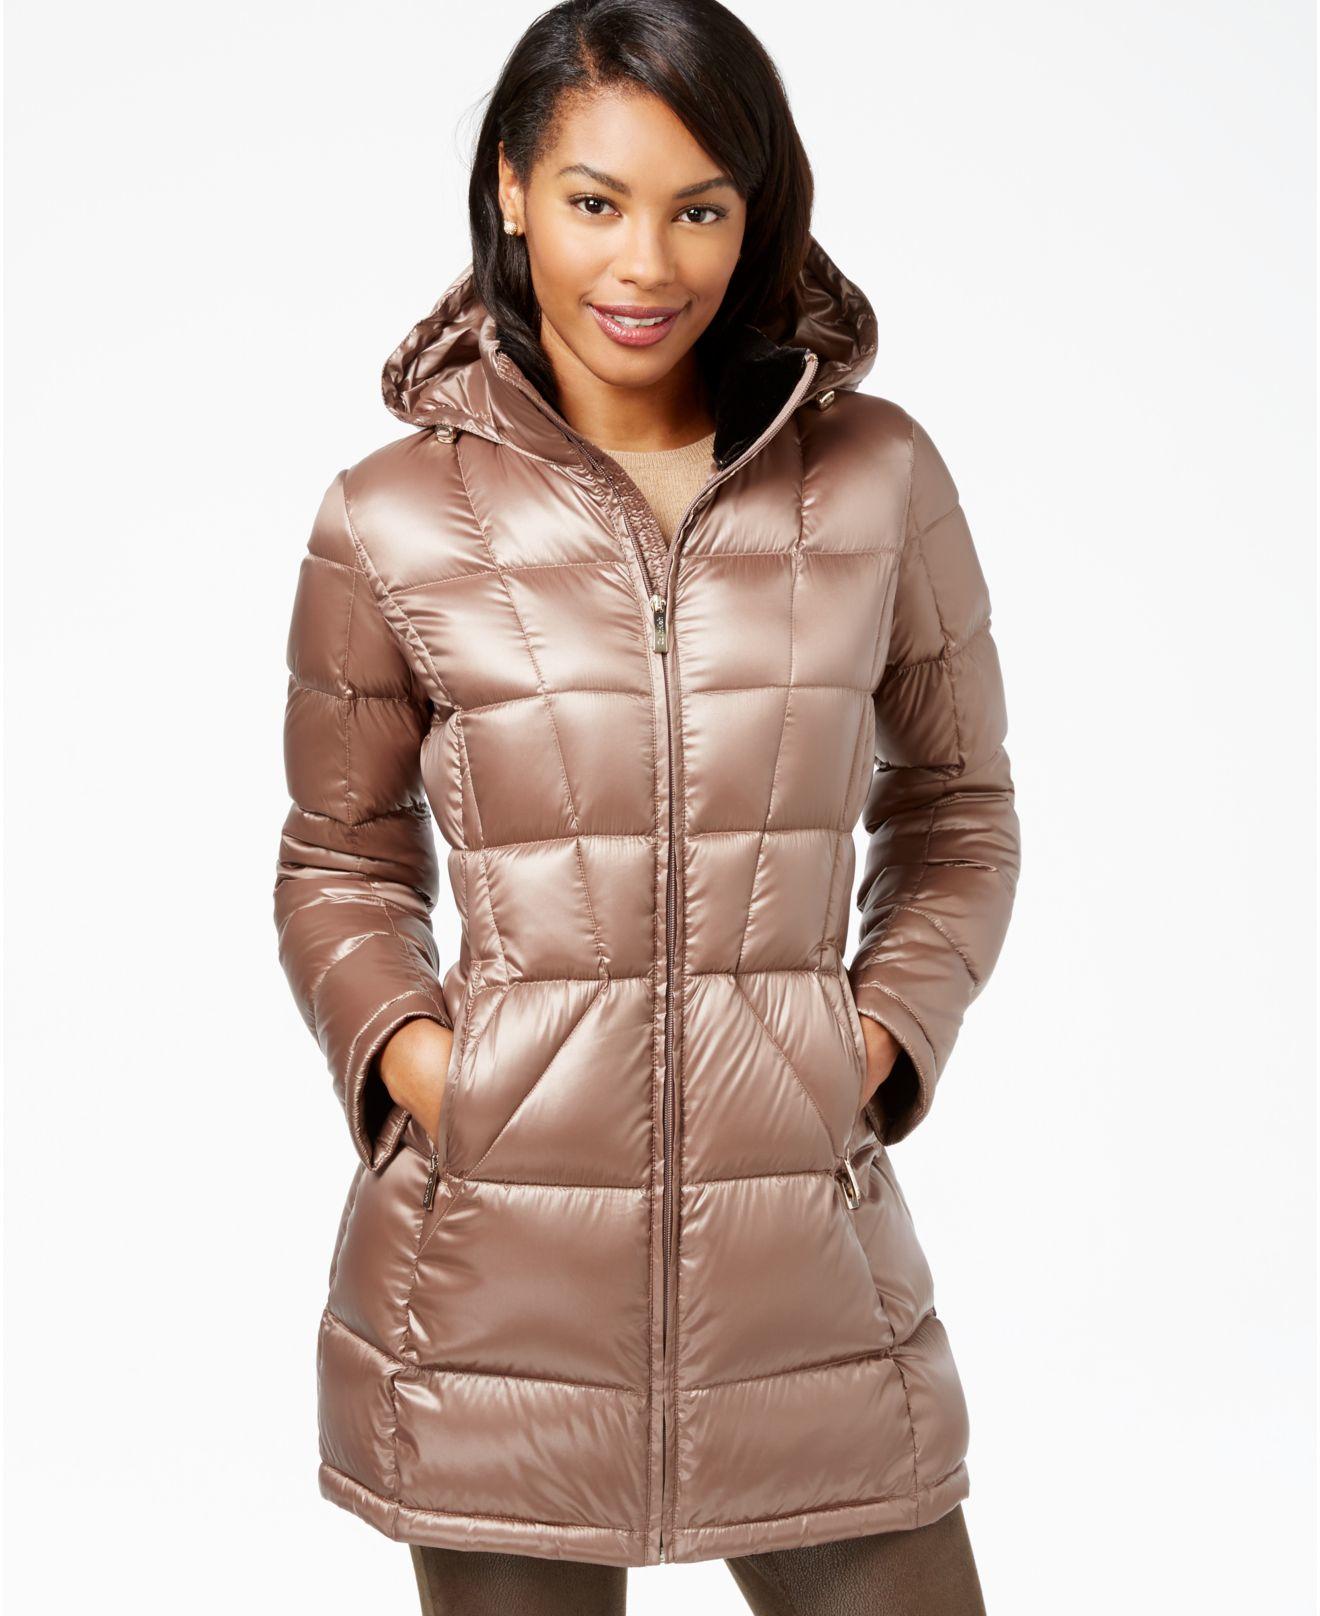 Lyst - Calvin Klein Hooded Down Packable Puffer Coat in Brown 76f6cc1ea6